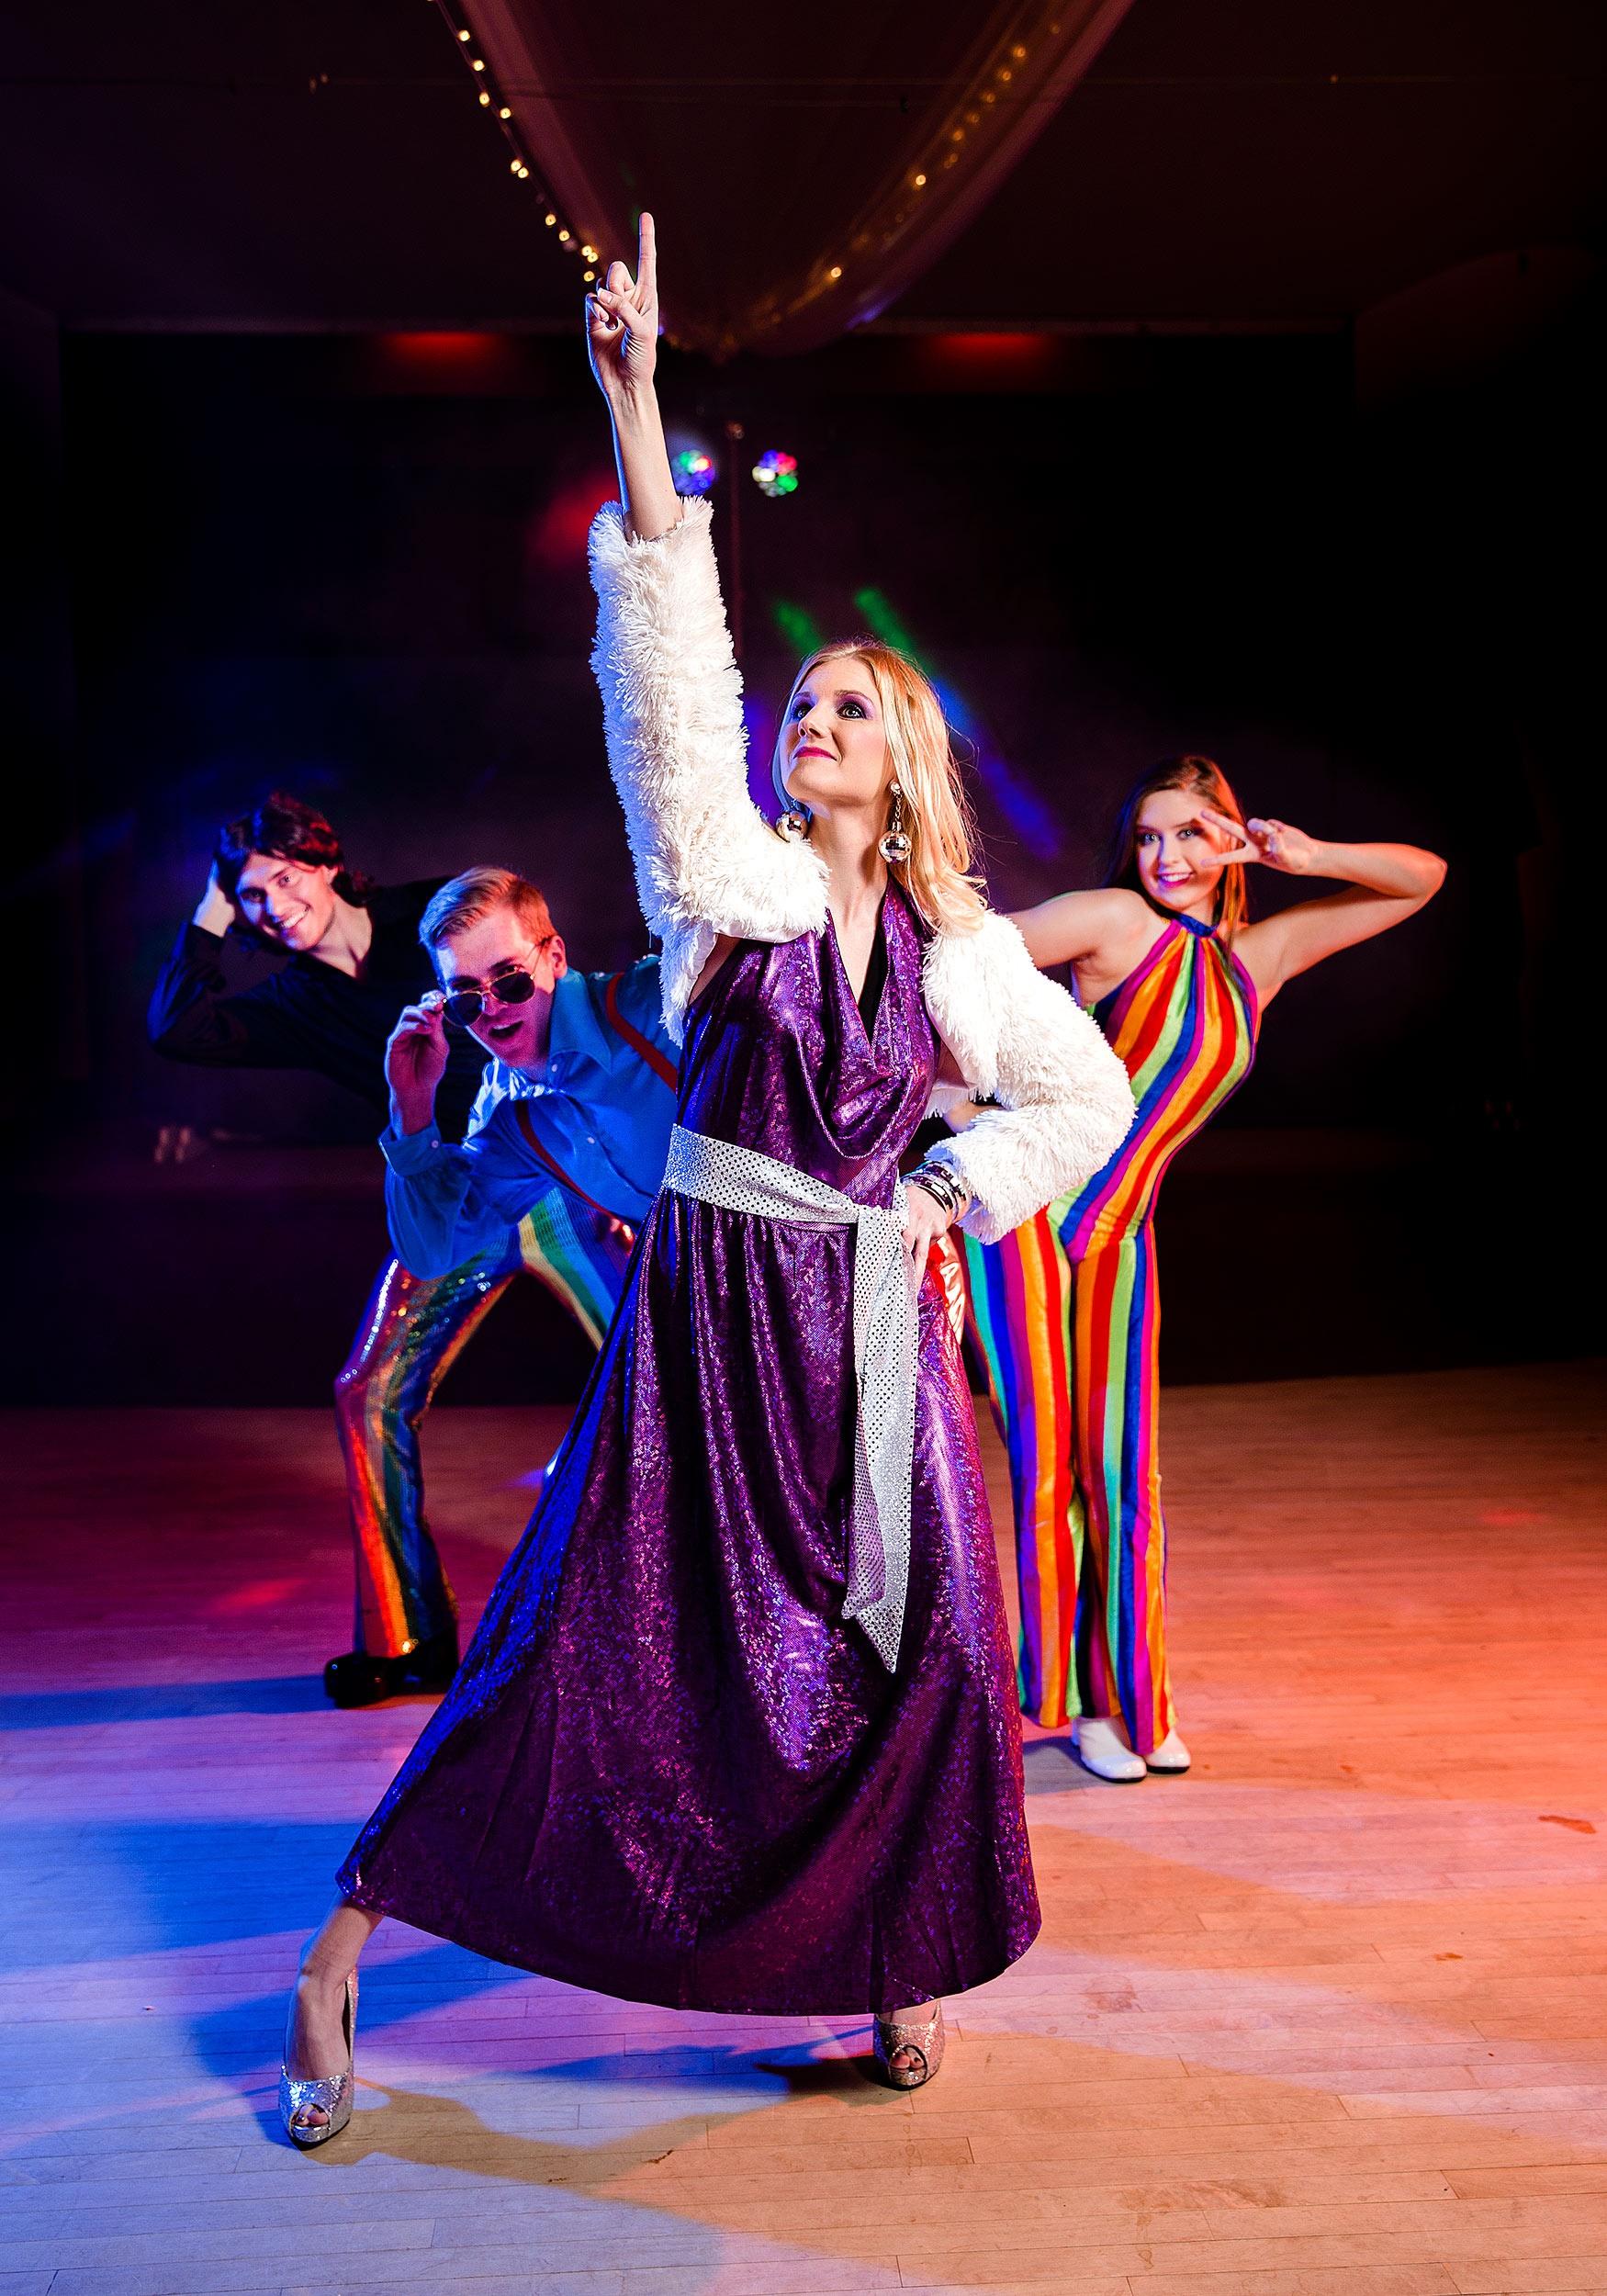 Women 39 s plus size disco ball diva costume 2x 3x - Discoteca diva ispra ...